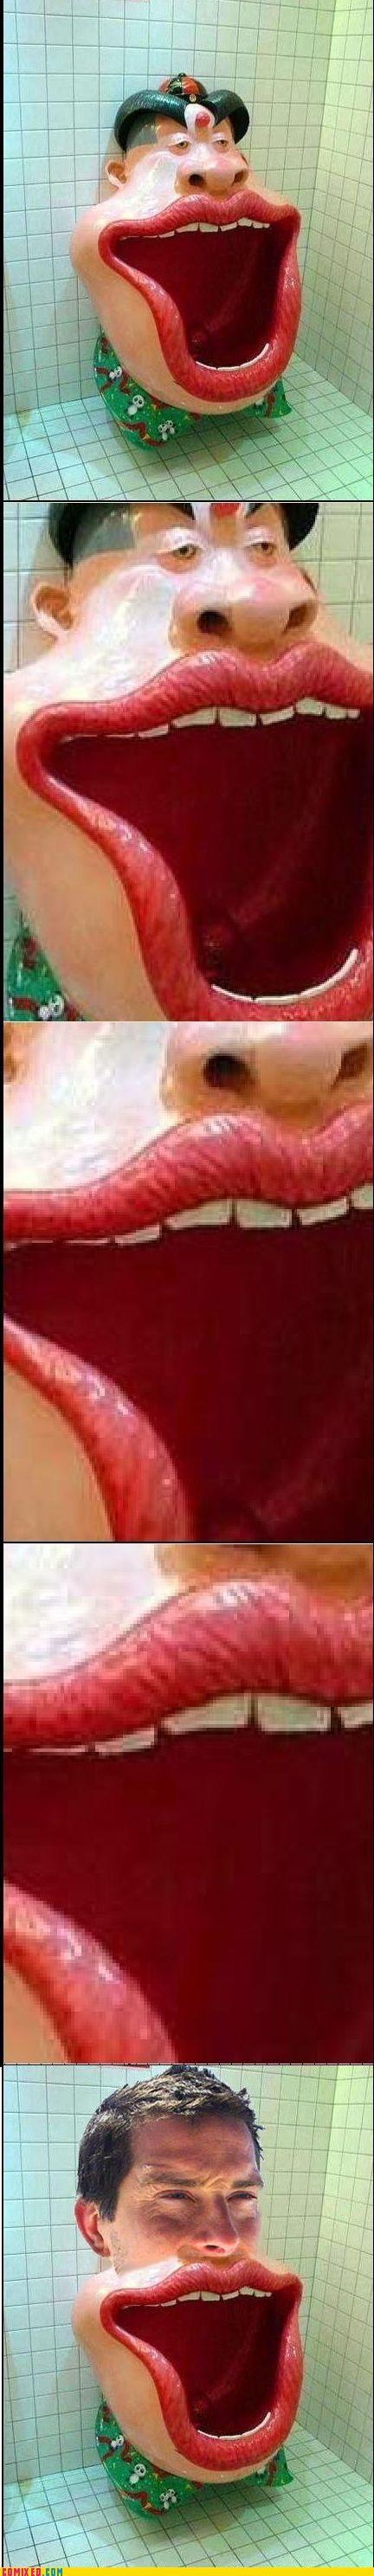 awesome bear grylls mouth pee TV urinal - 4950445312